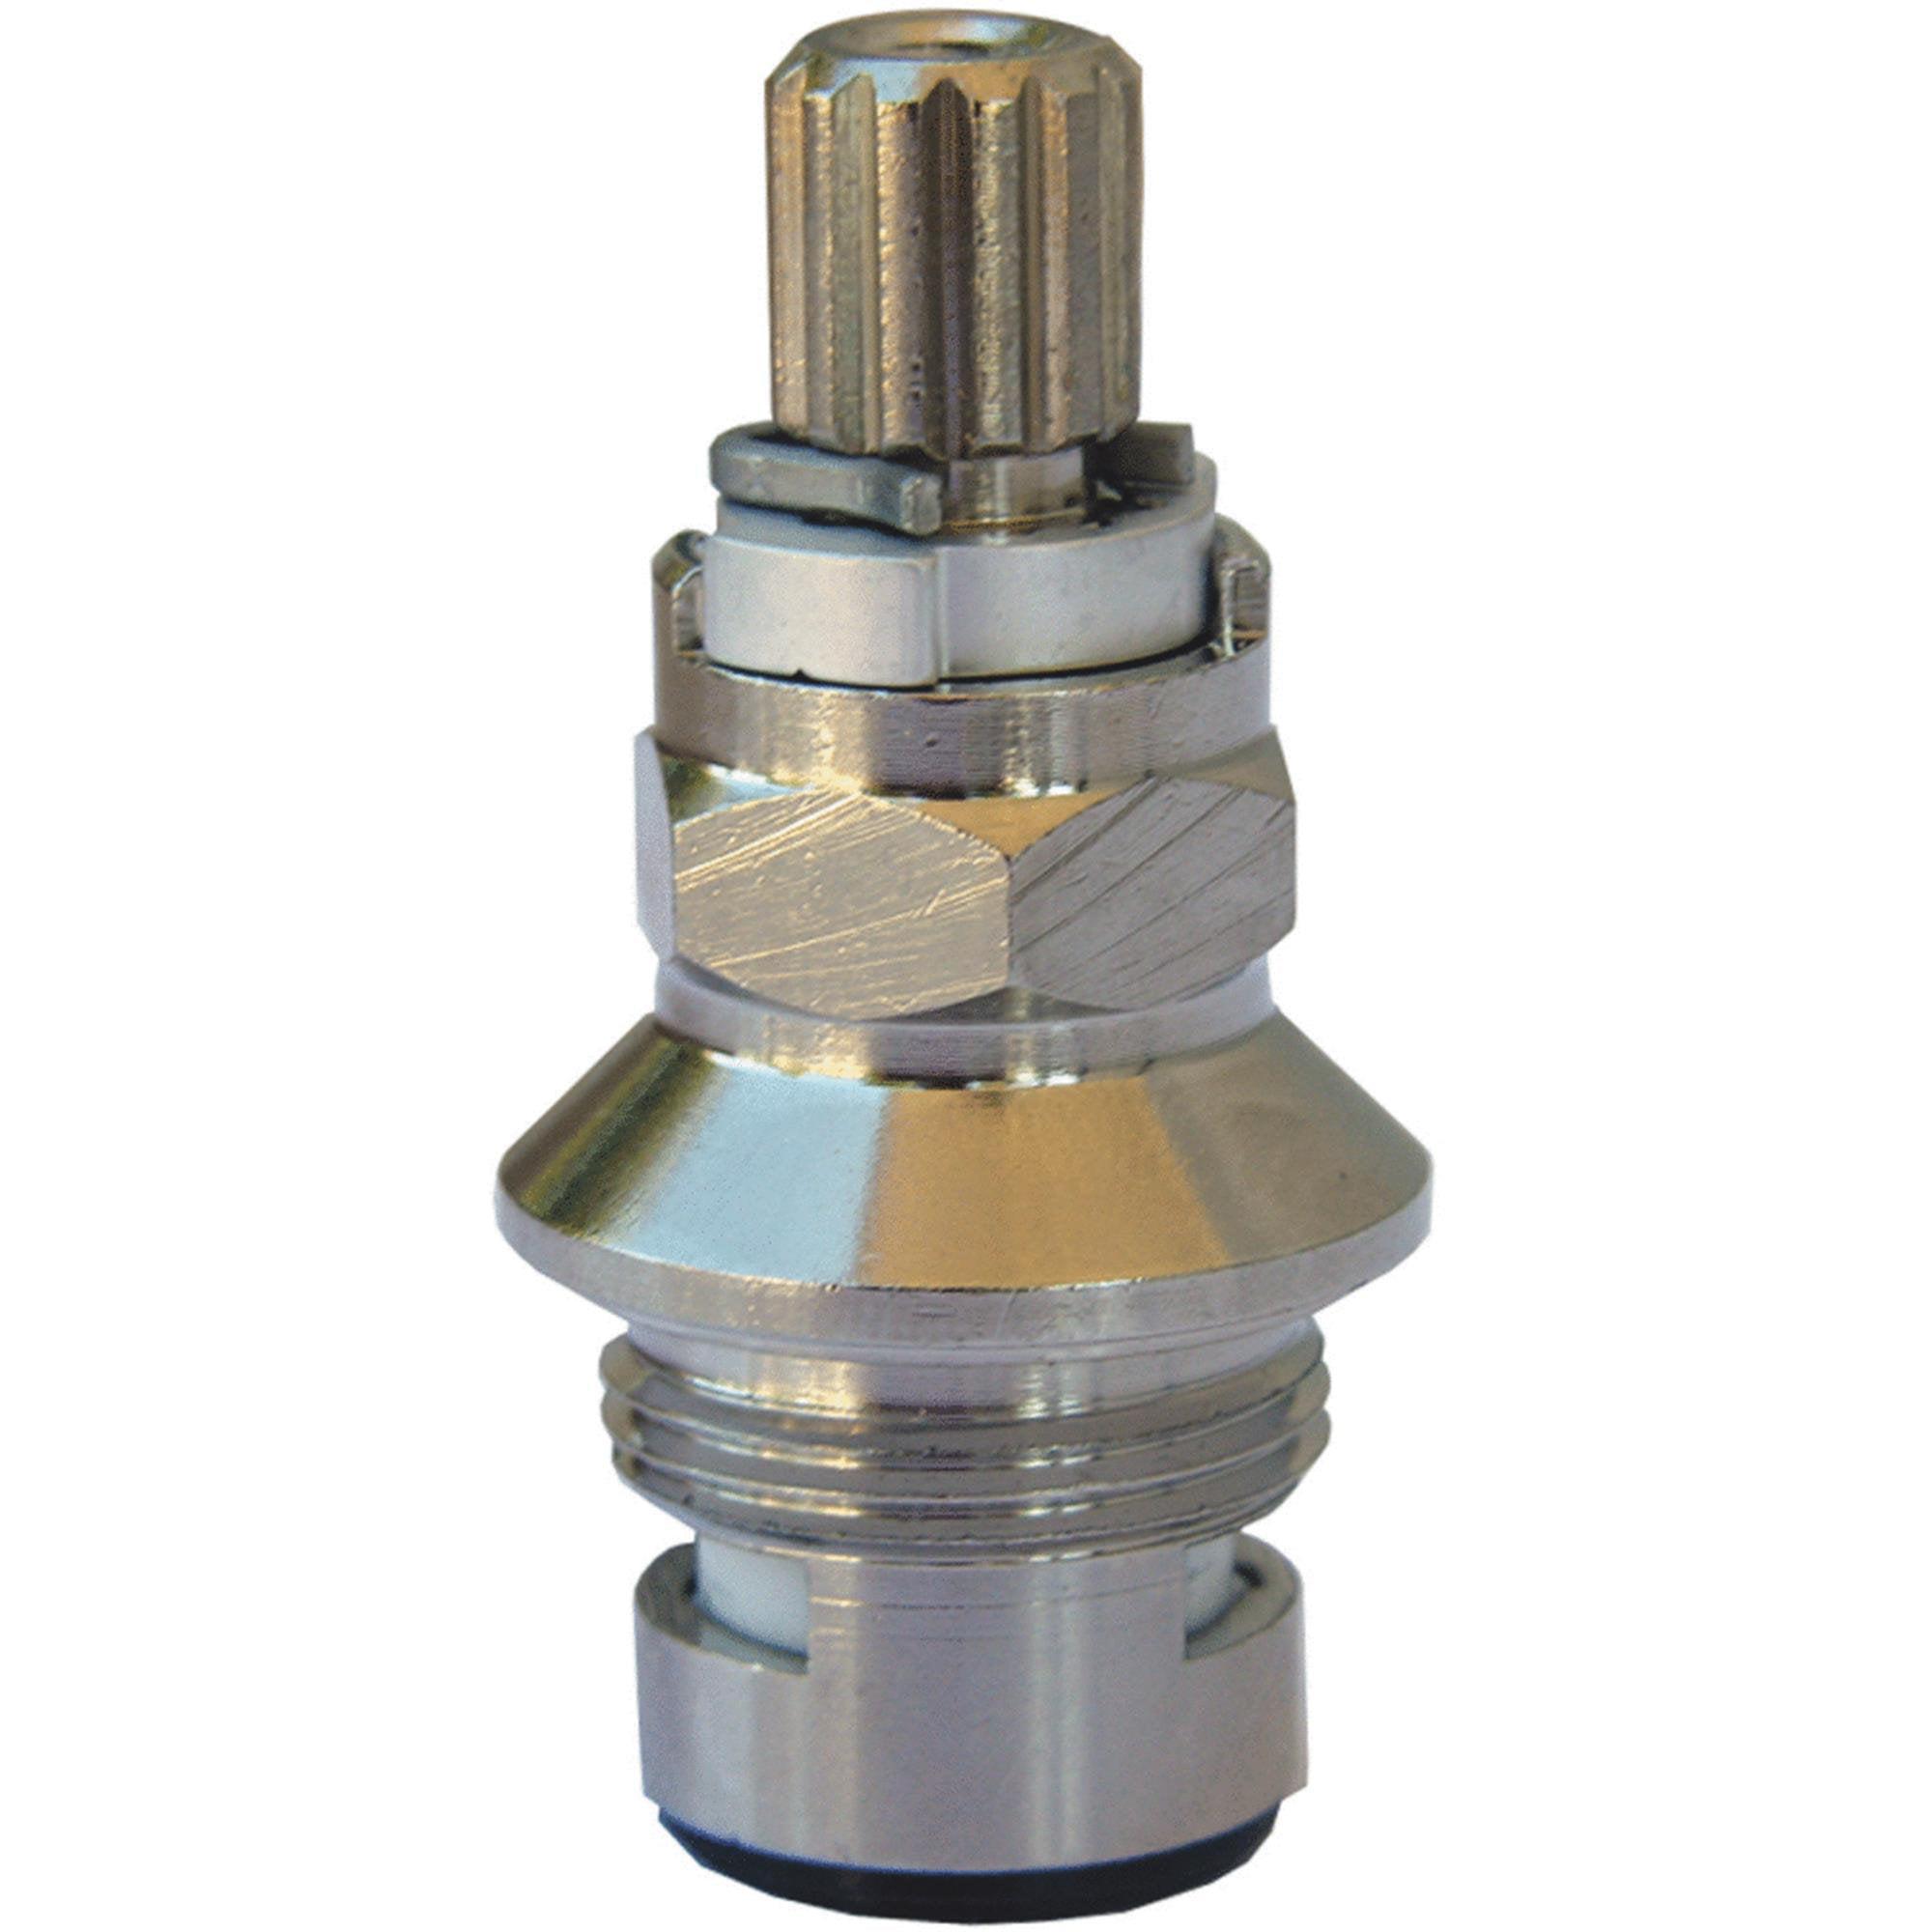 Lasco Price Pfister No. 2076 Faucet Stem by Larsen Supply